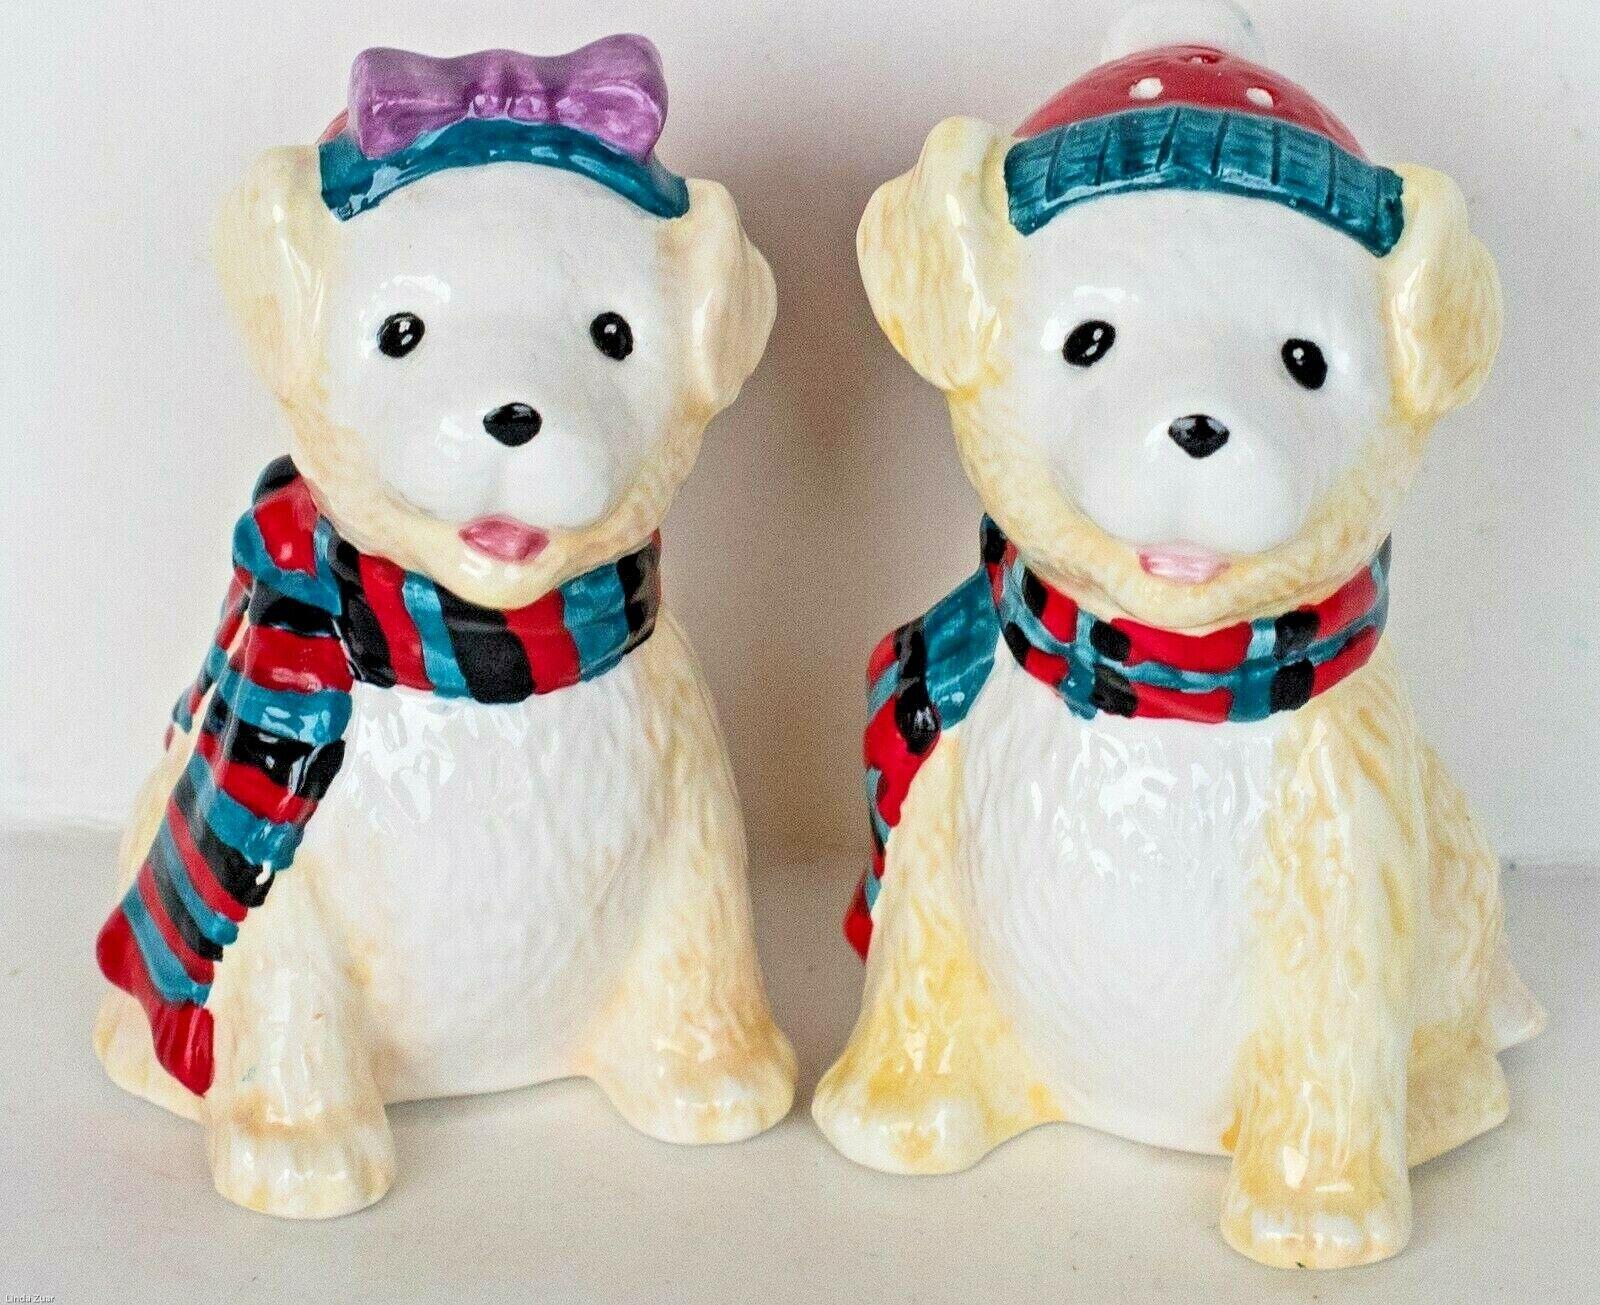 ADORABLE PORCELAIN WINTER DOG CAT SALT PEPPER SHAKERS BRAND NEW  - $4.99